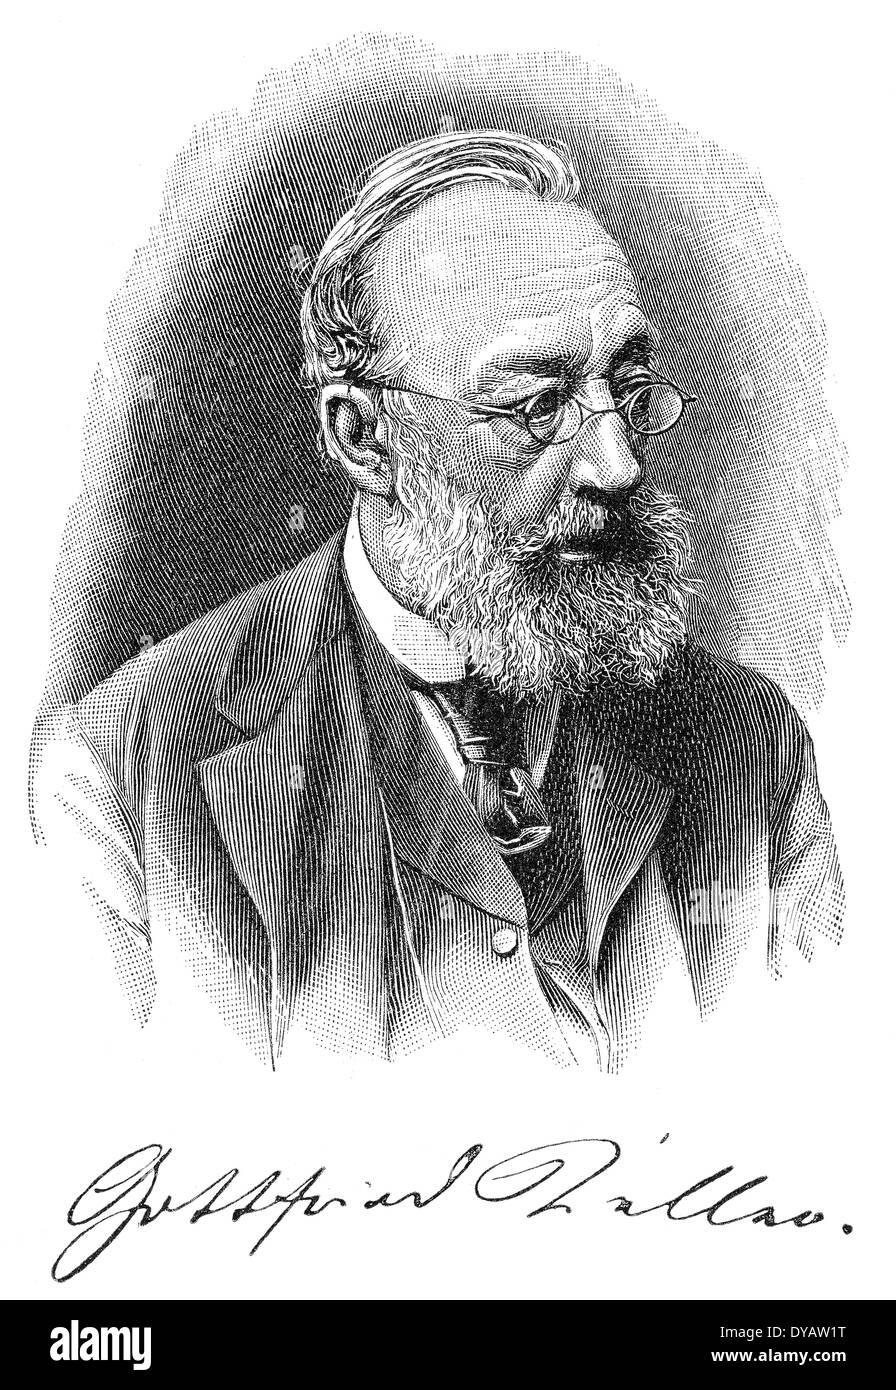 Gottfried Keller, 1819 - 1890, a Swiss poet and writer of German literature - Stock Image